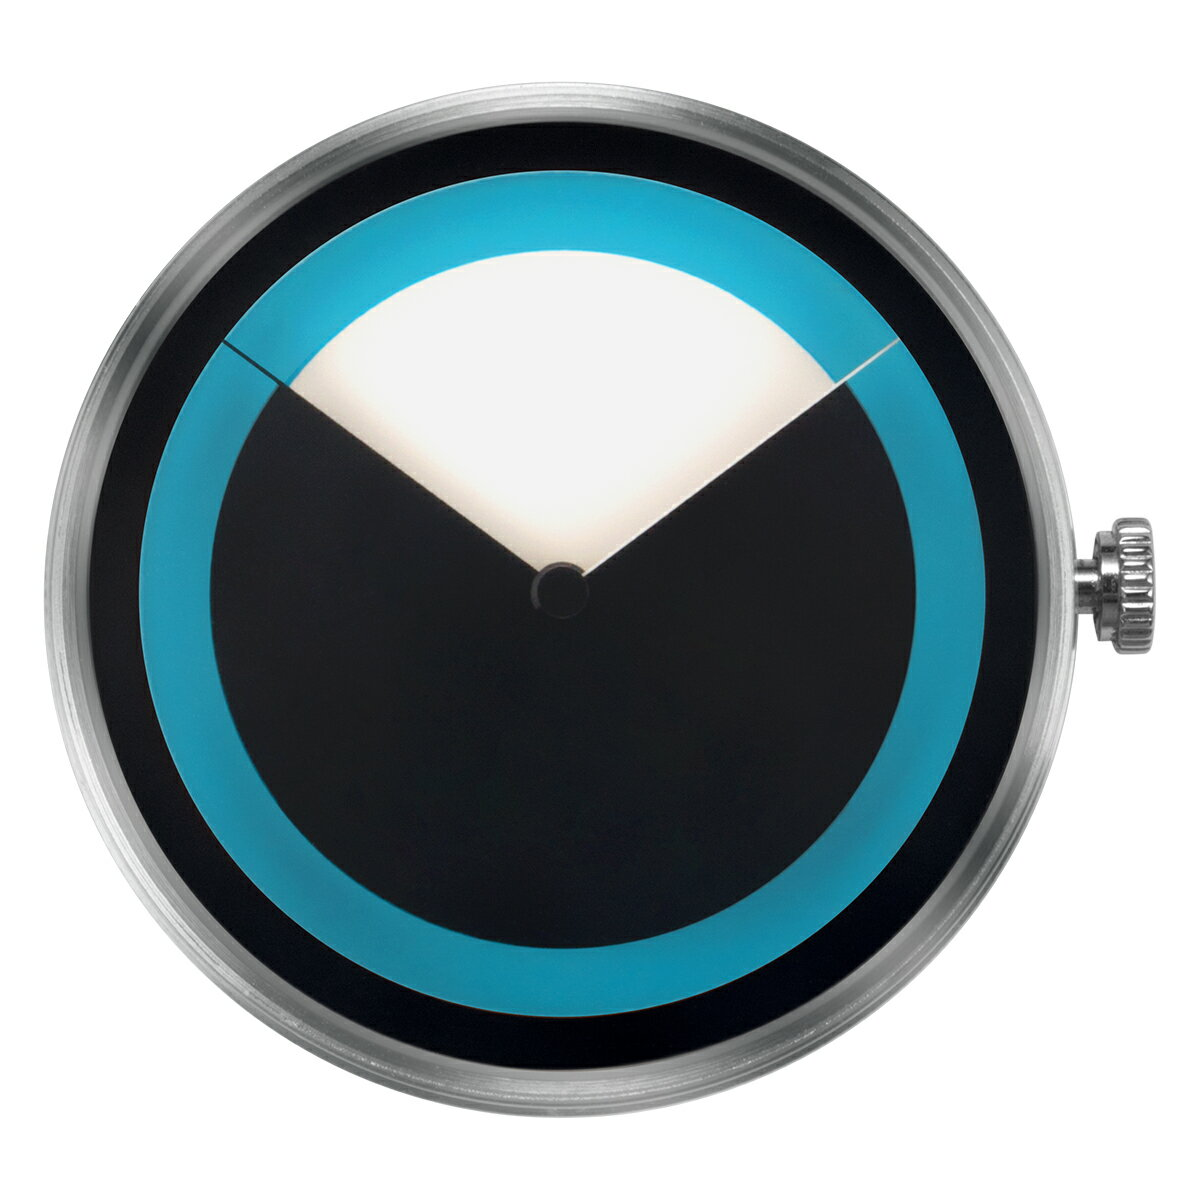 ZEROO 交換用クロックボディ ZEROO DEEPSKY SWEEPING ゼロ 電池式クォーツ 腕時計 [M04011]